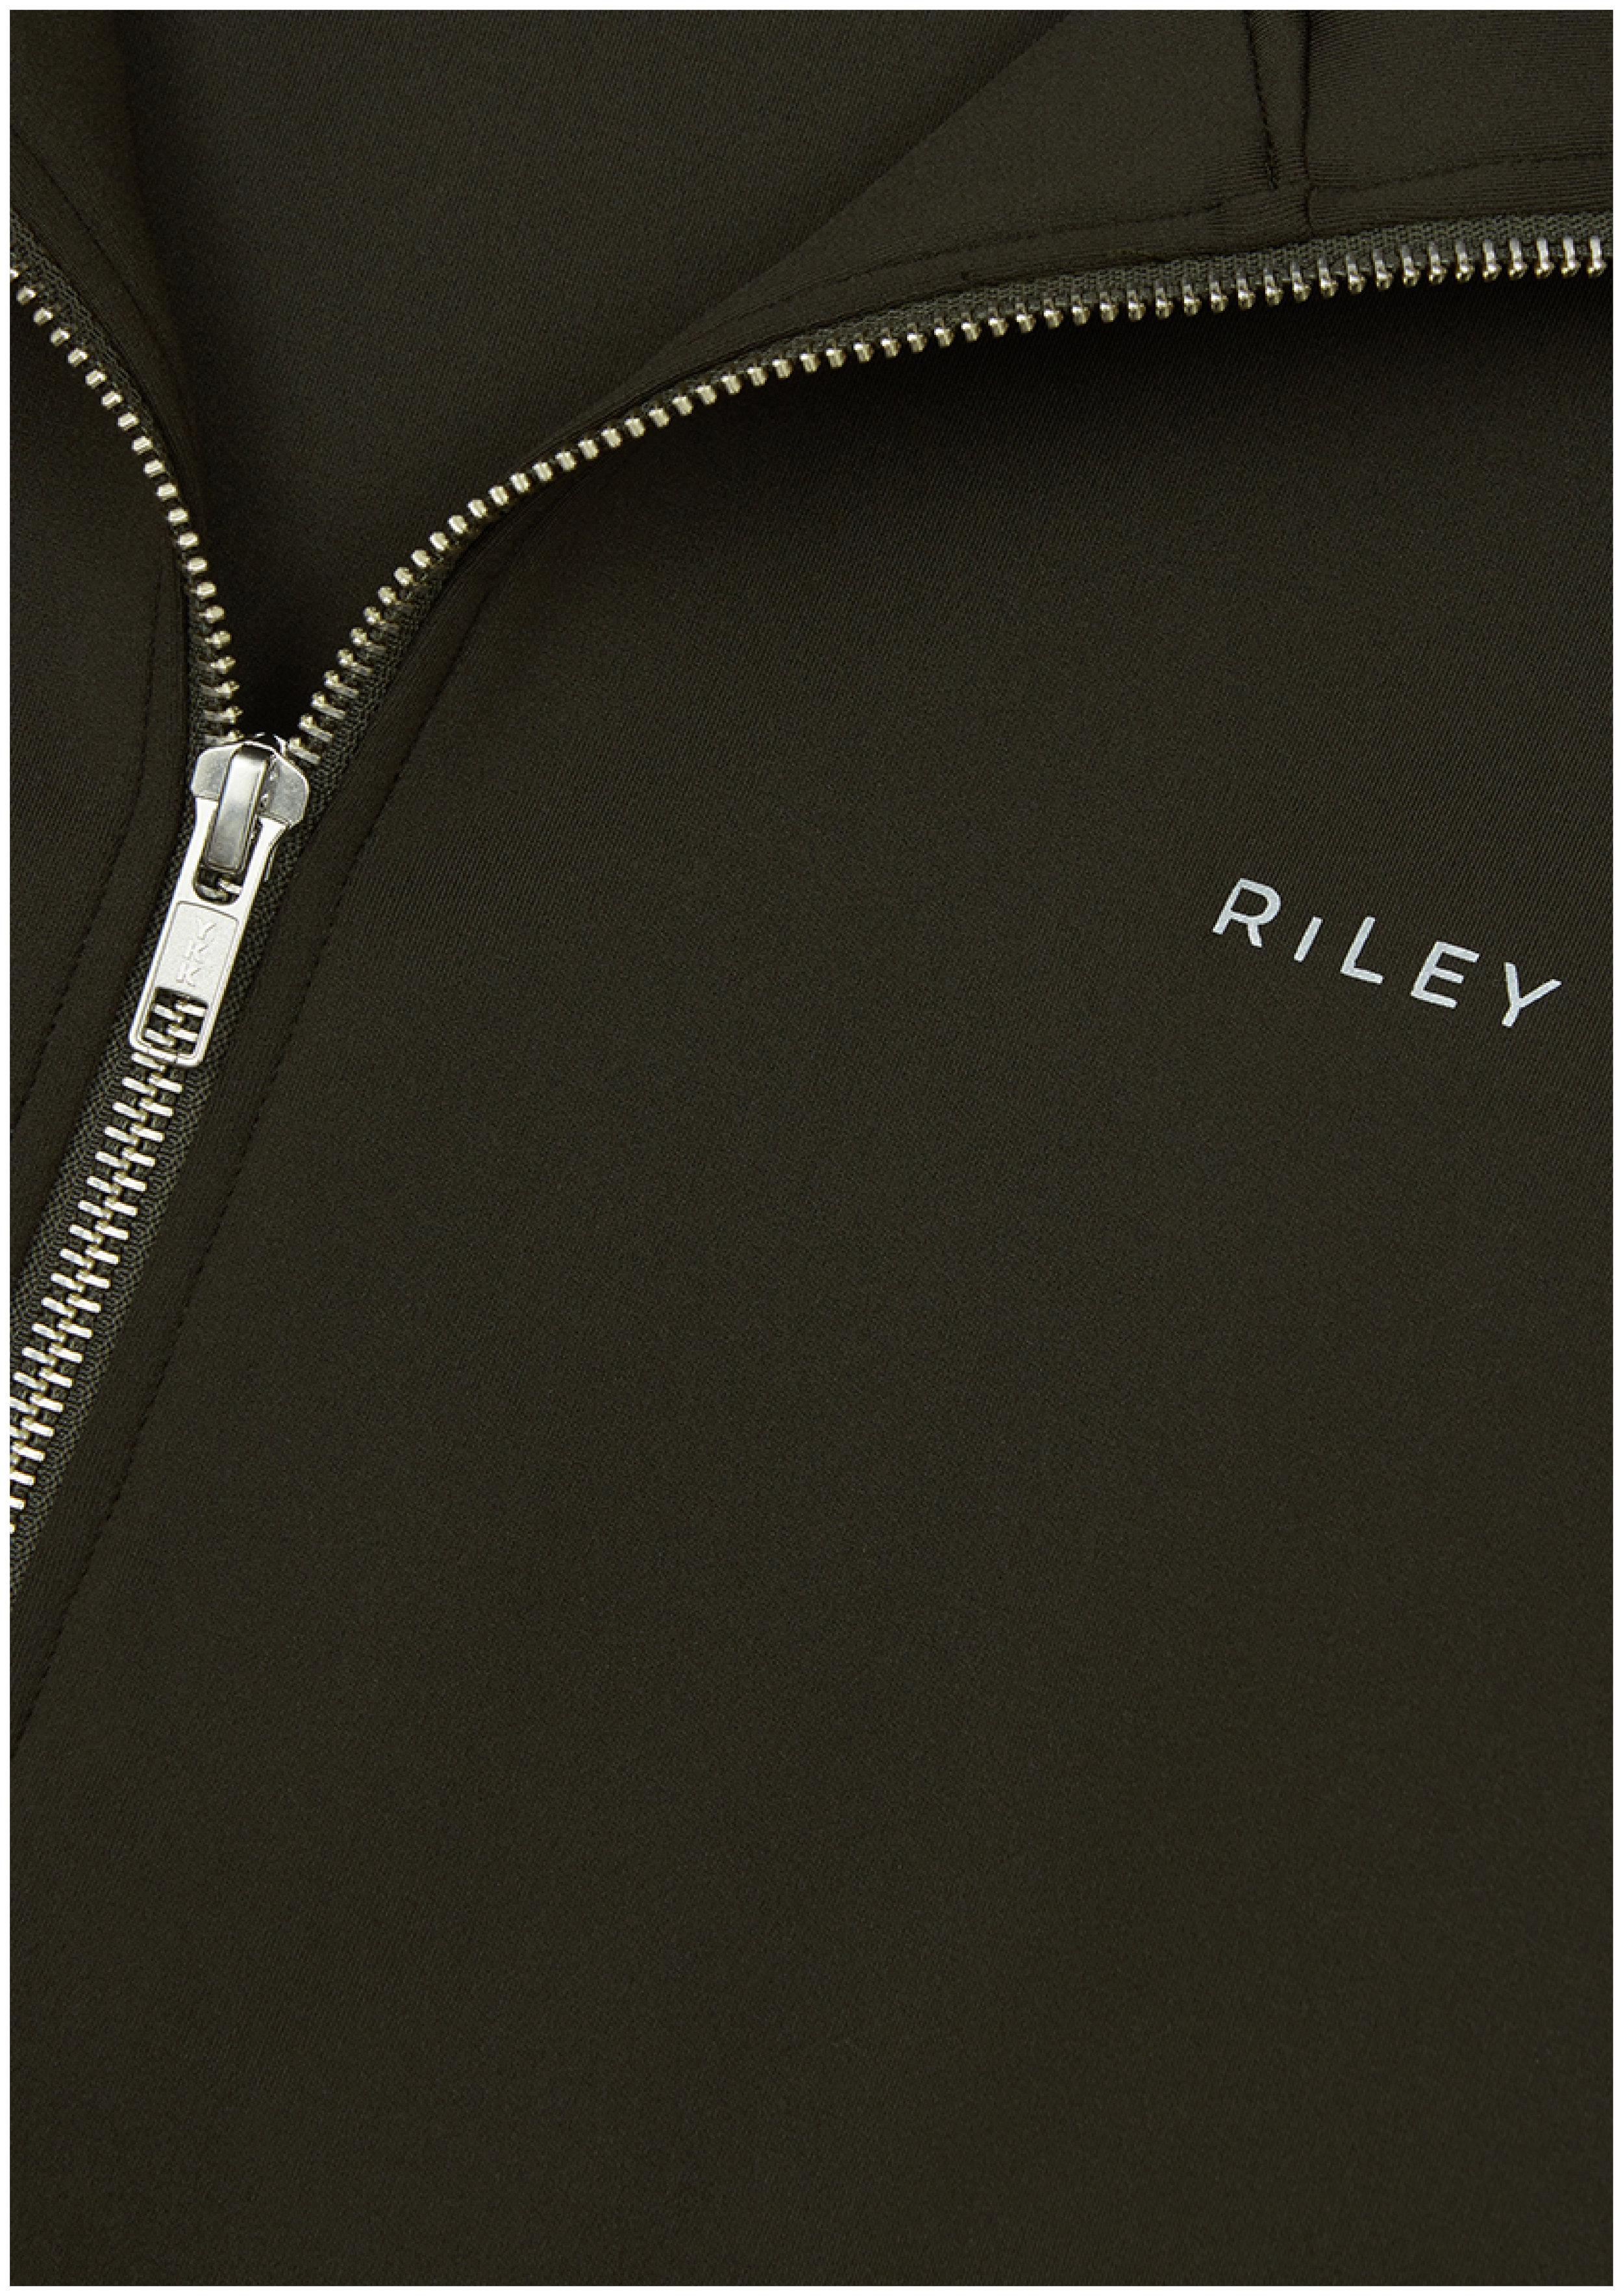 Riley_Brandmark2.jpg